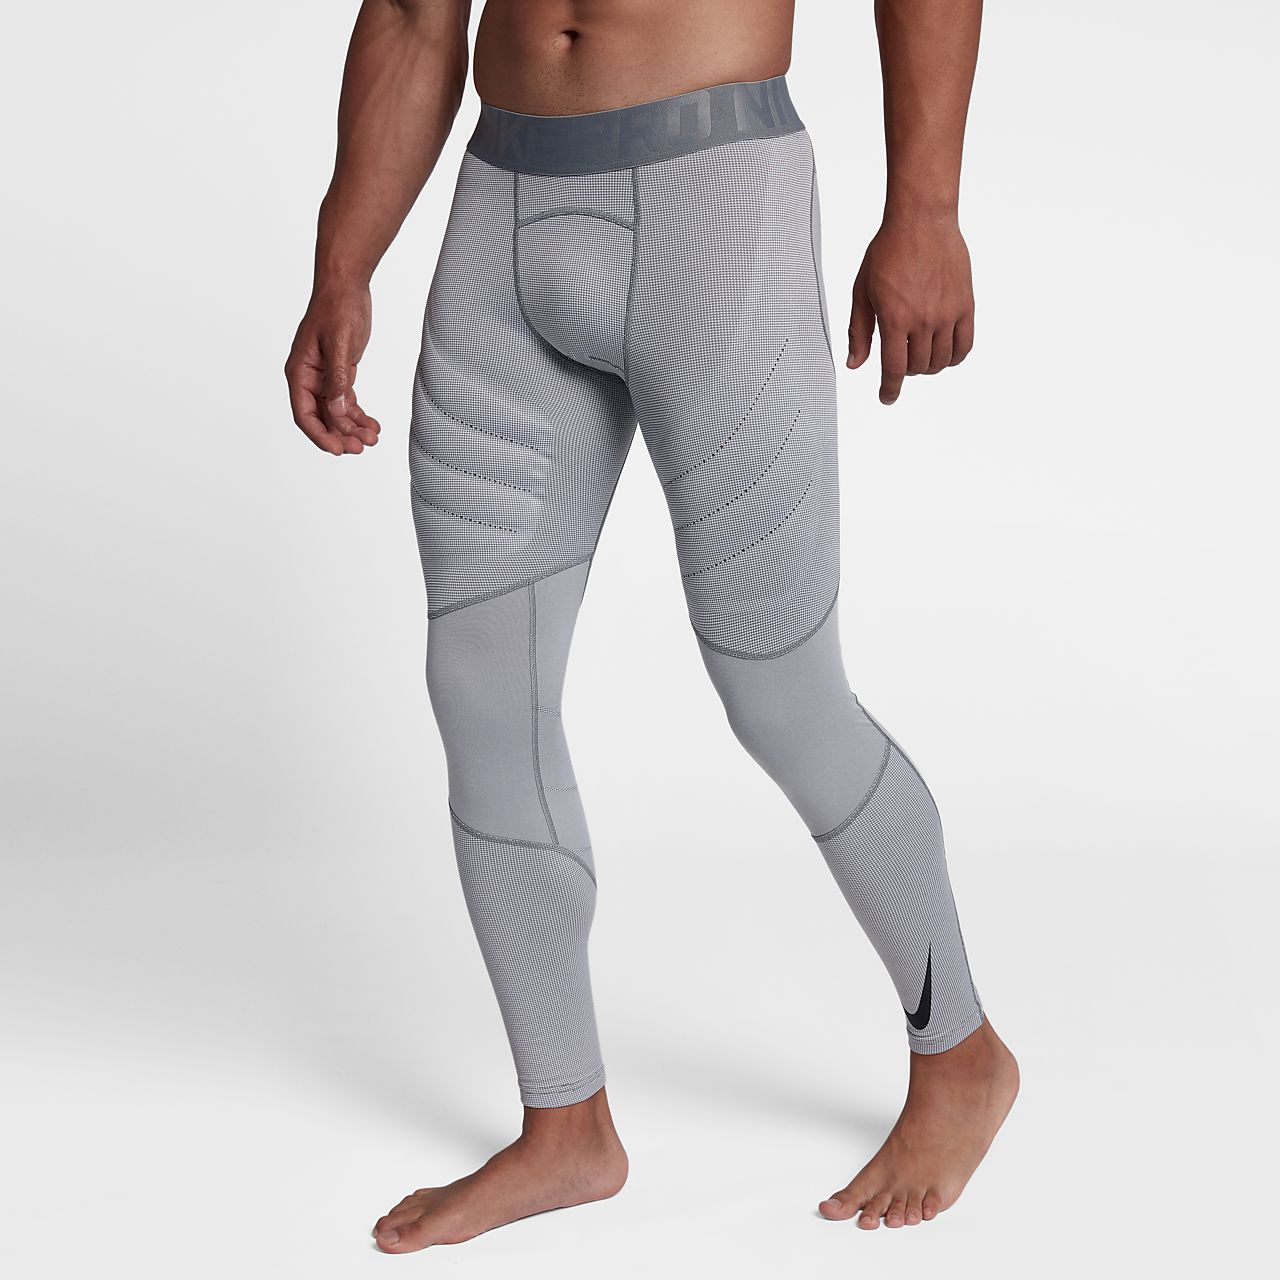 nike 3 4 compression pants. next nike 3 4 compression pants s